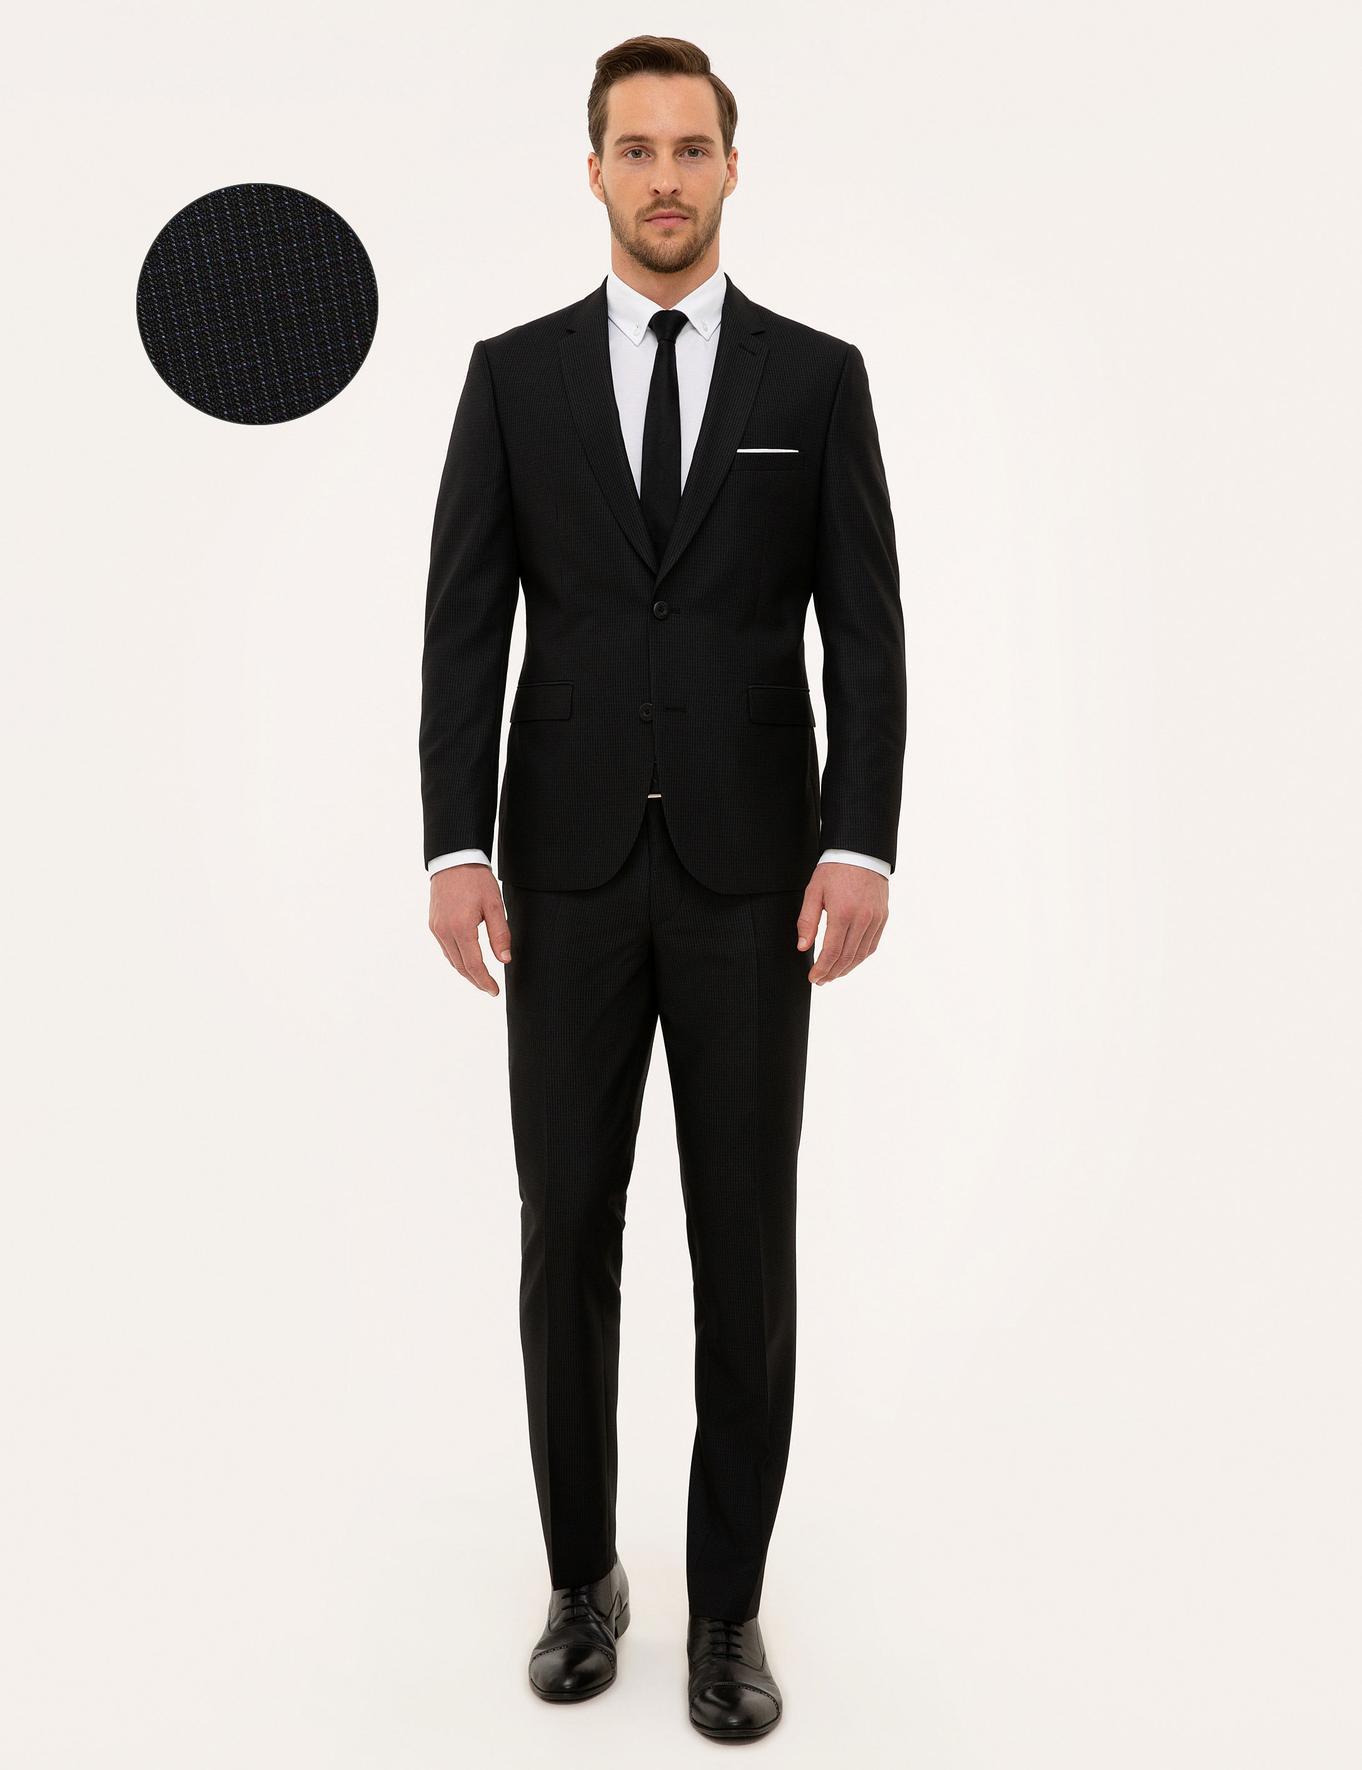 Koyu Lacivert Slim Fit Takım Elbise